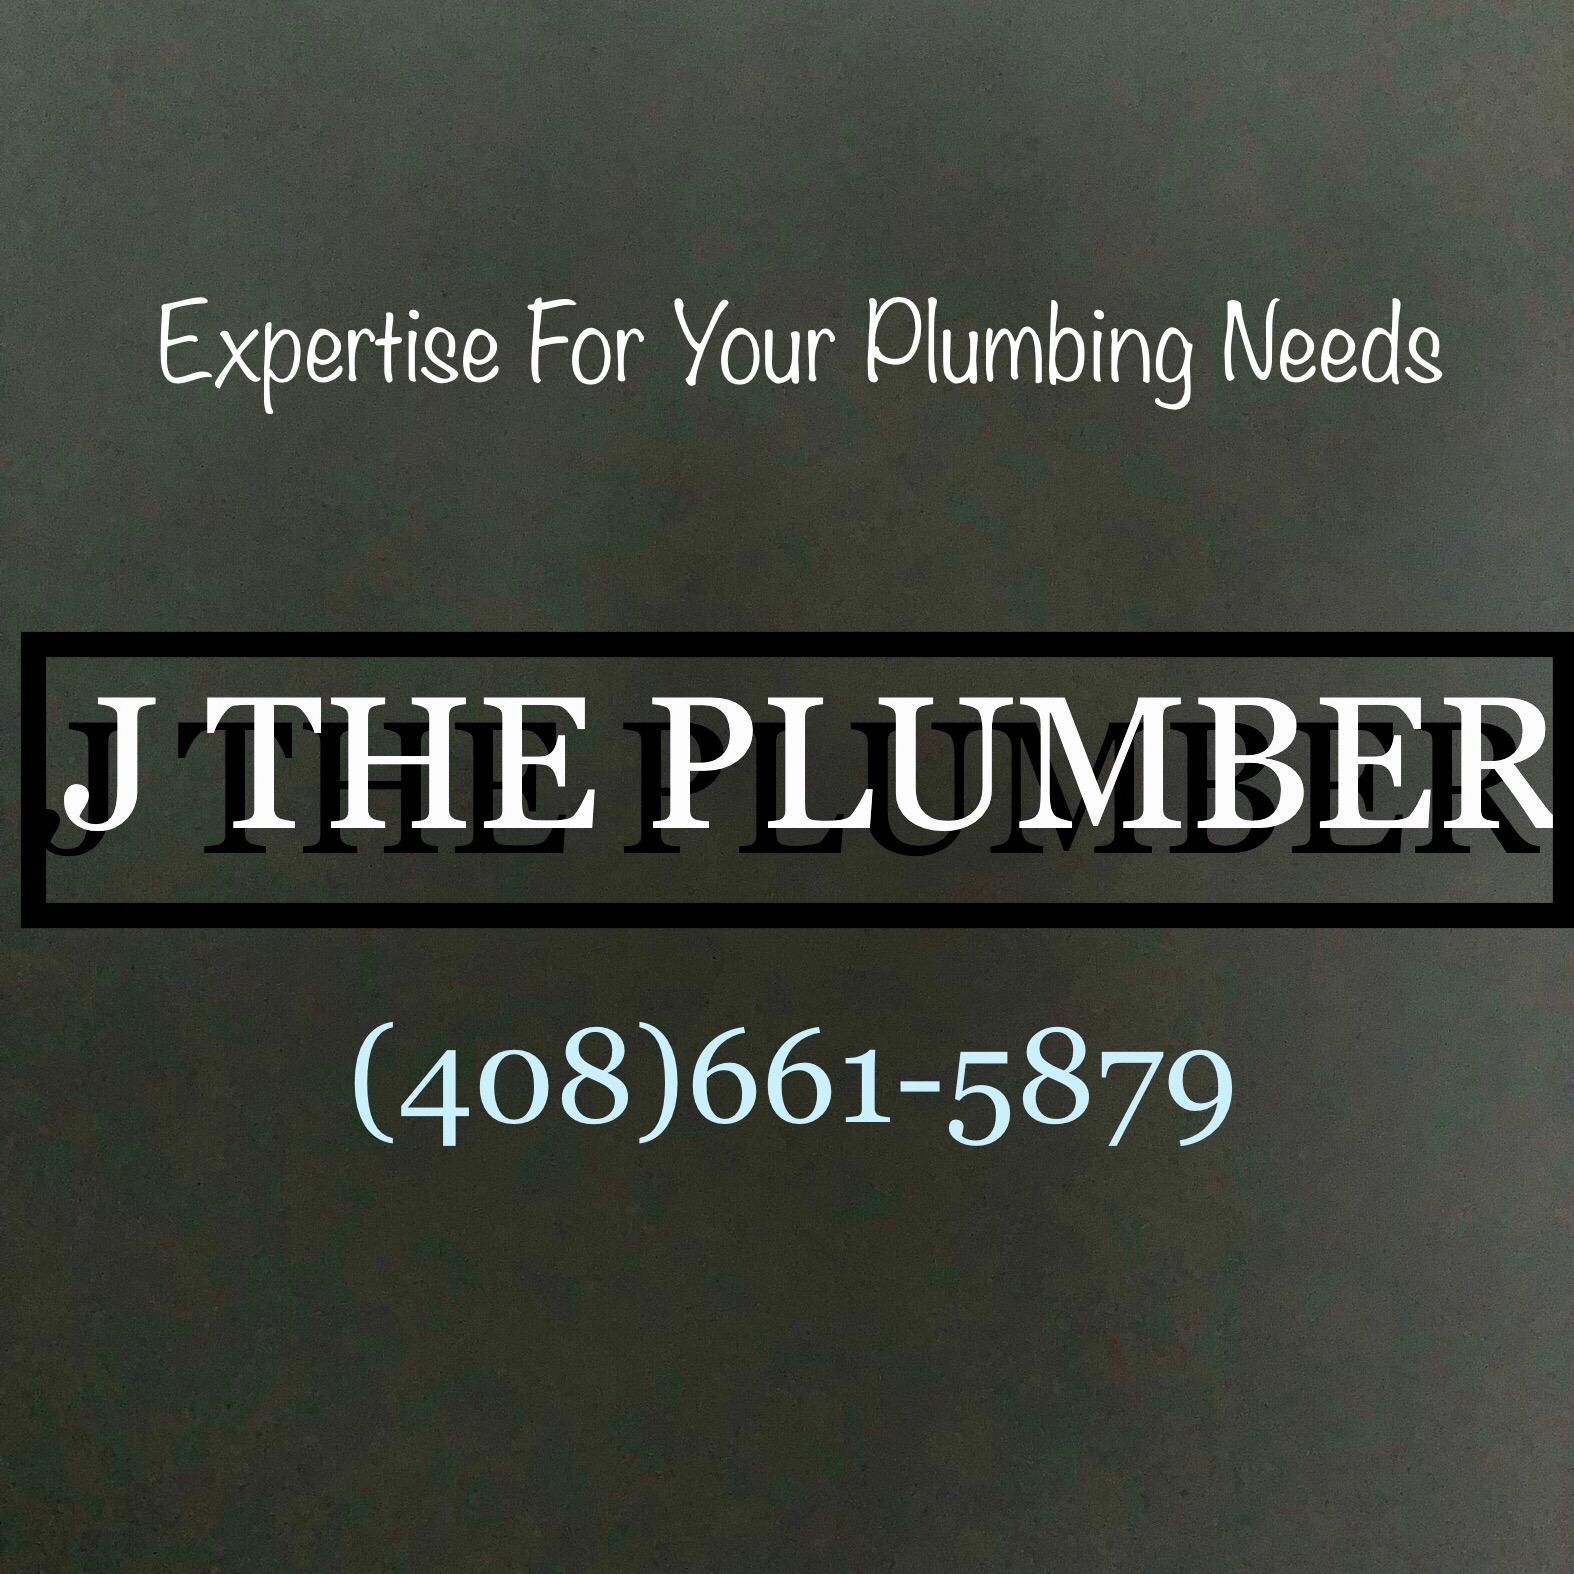 J The Plumber